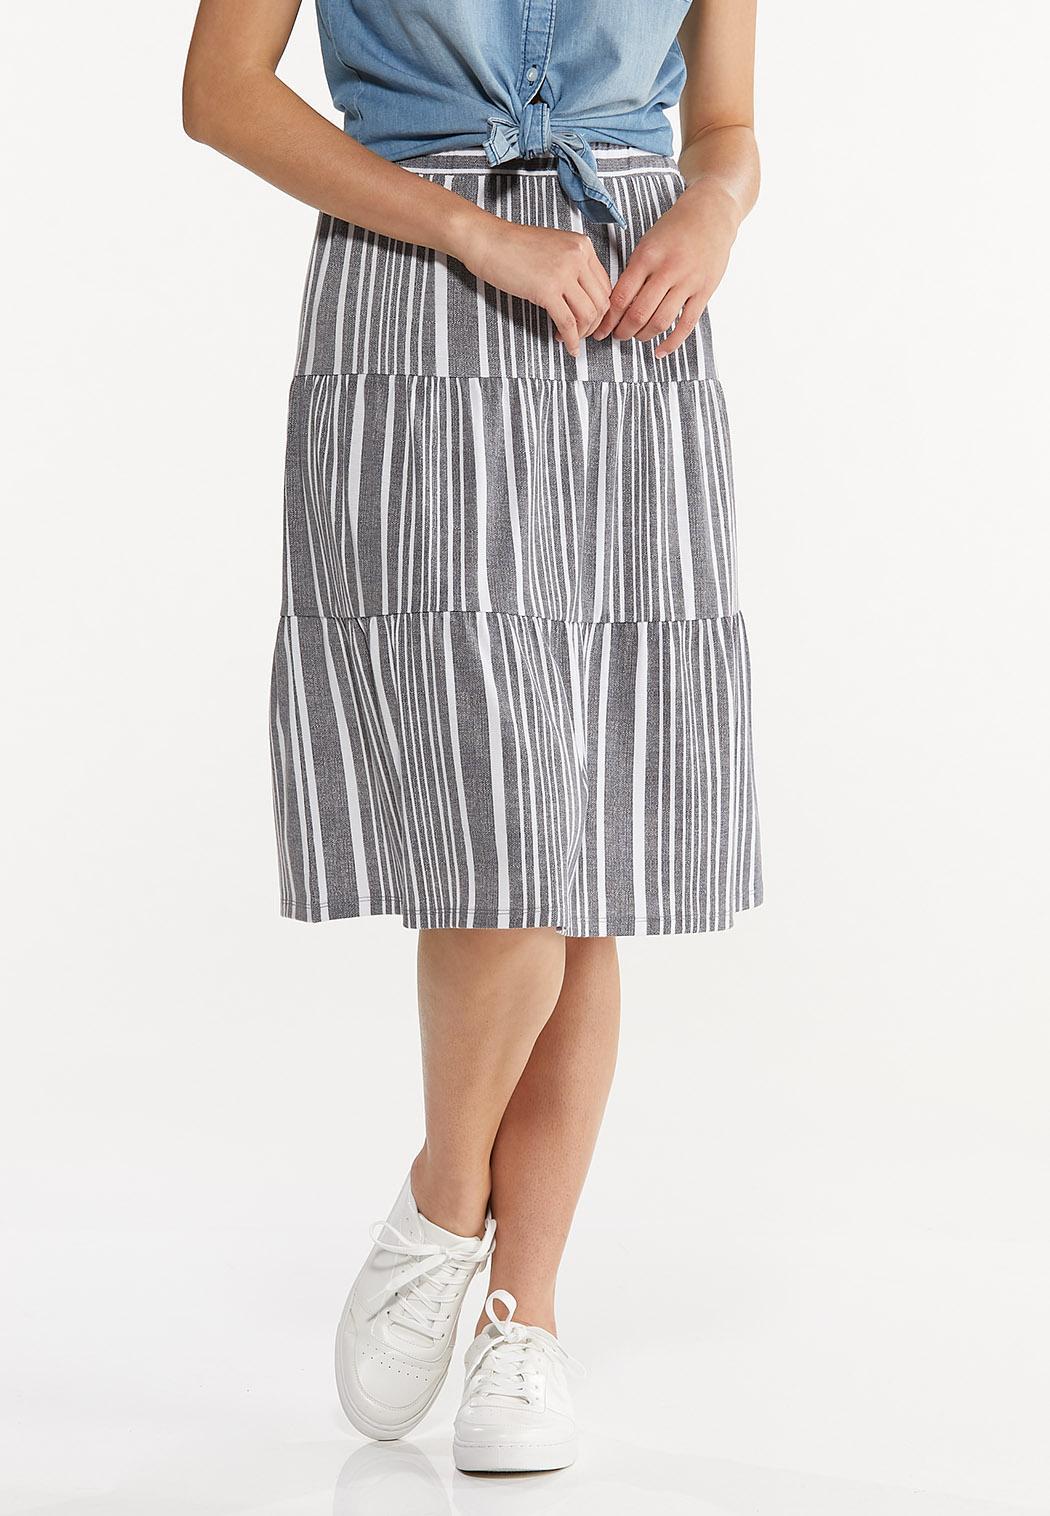 Plus Size Blue Striped Skirt